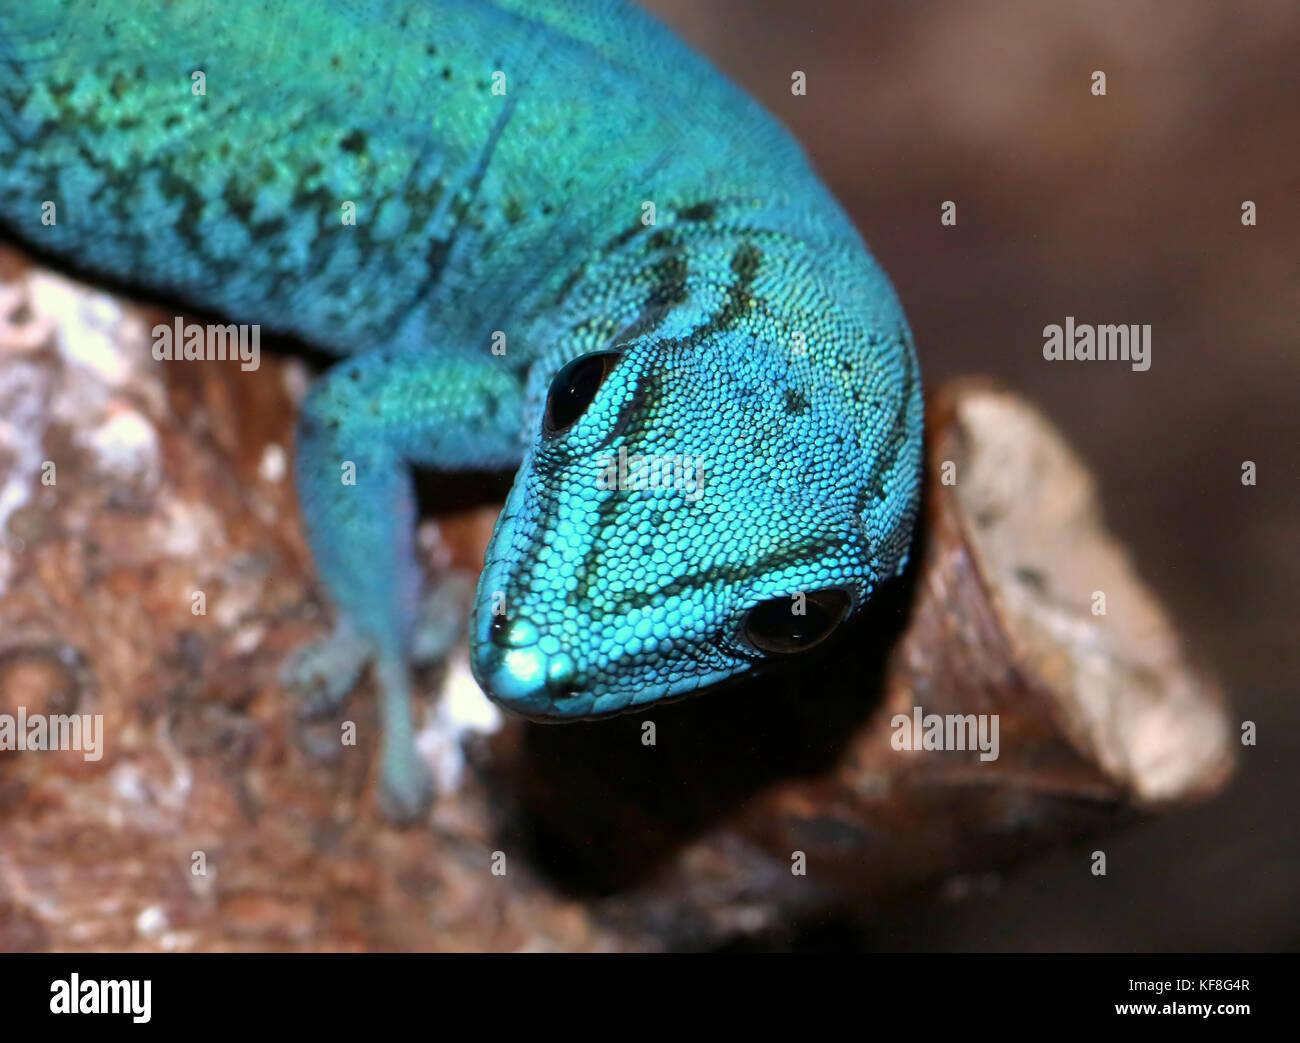 Closeup of the head of a Tanzanian Turquoise Dwarf Gecko or William's dwarf gecko (Lygodactylus williamsi ), also Electric Blue Gecko Stock Photo